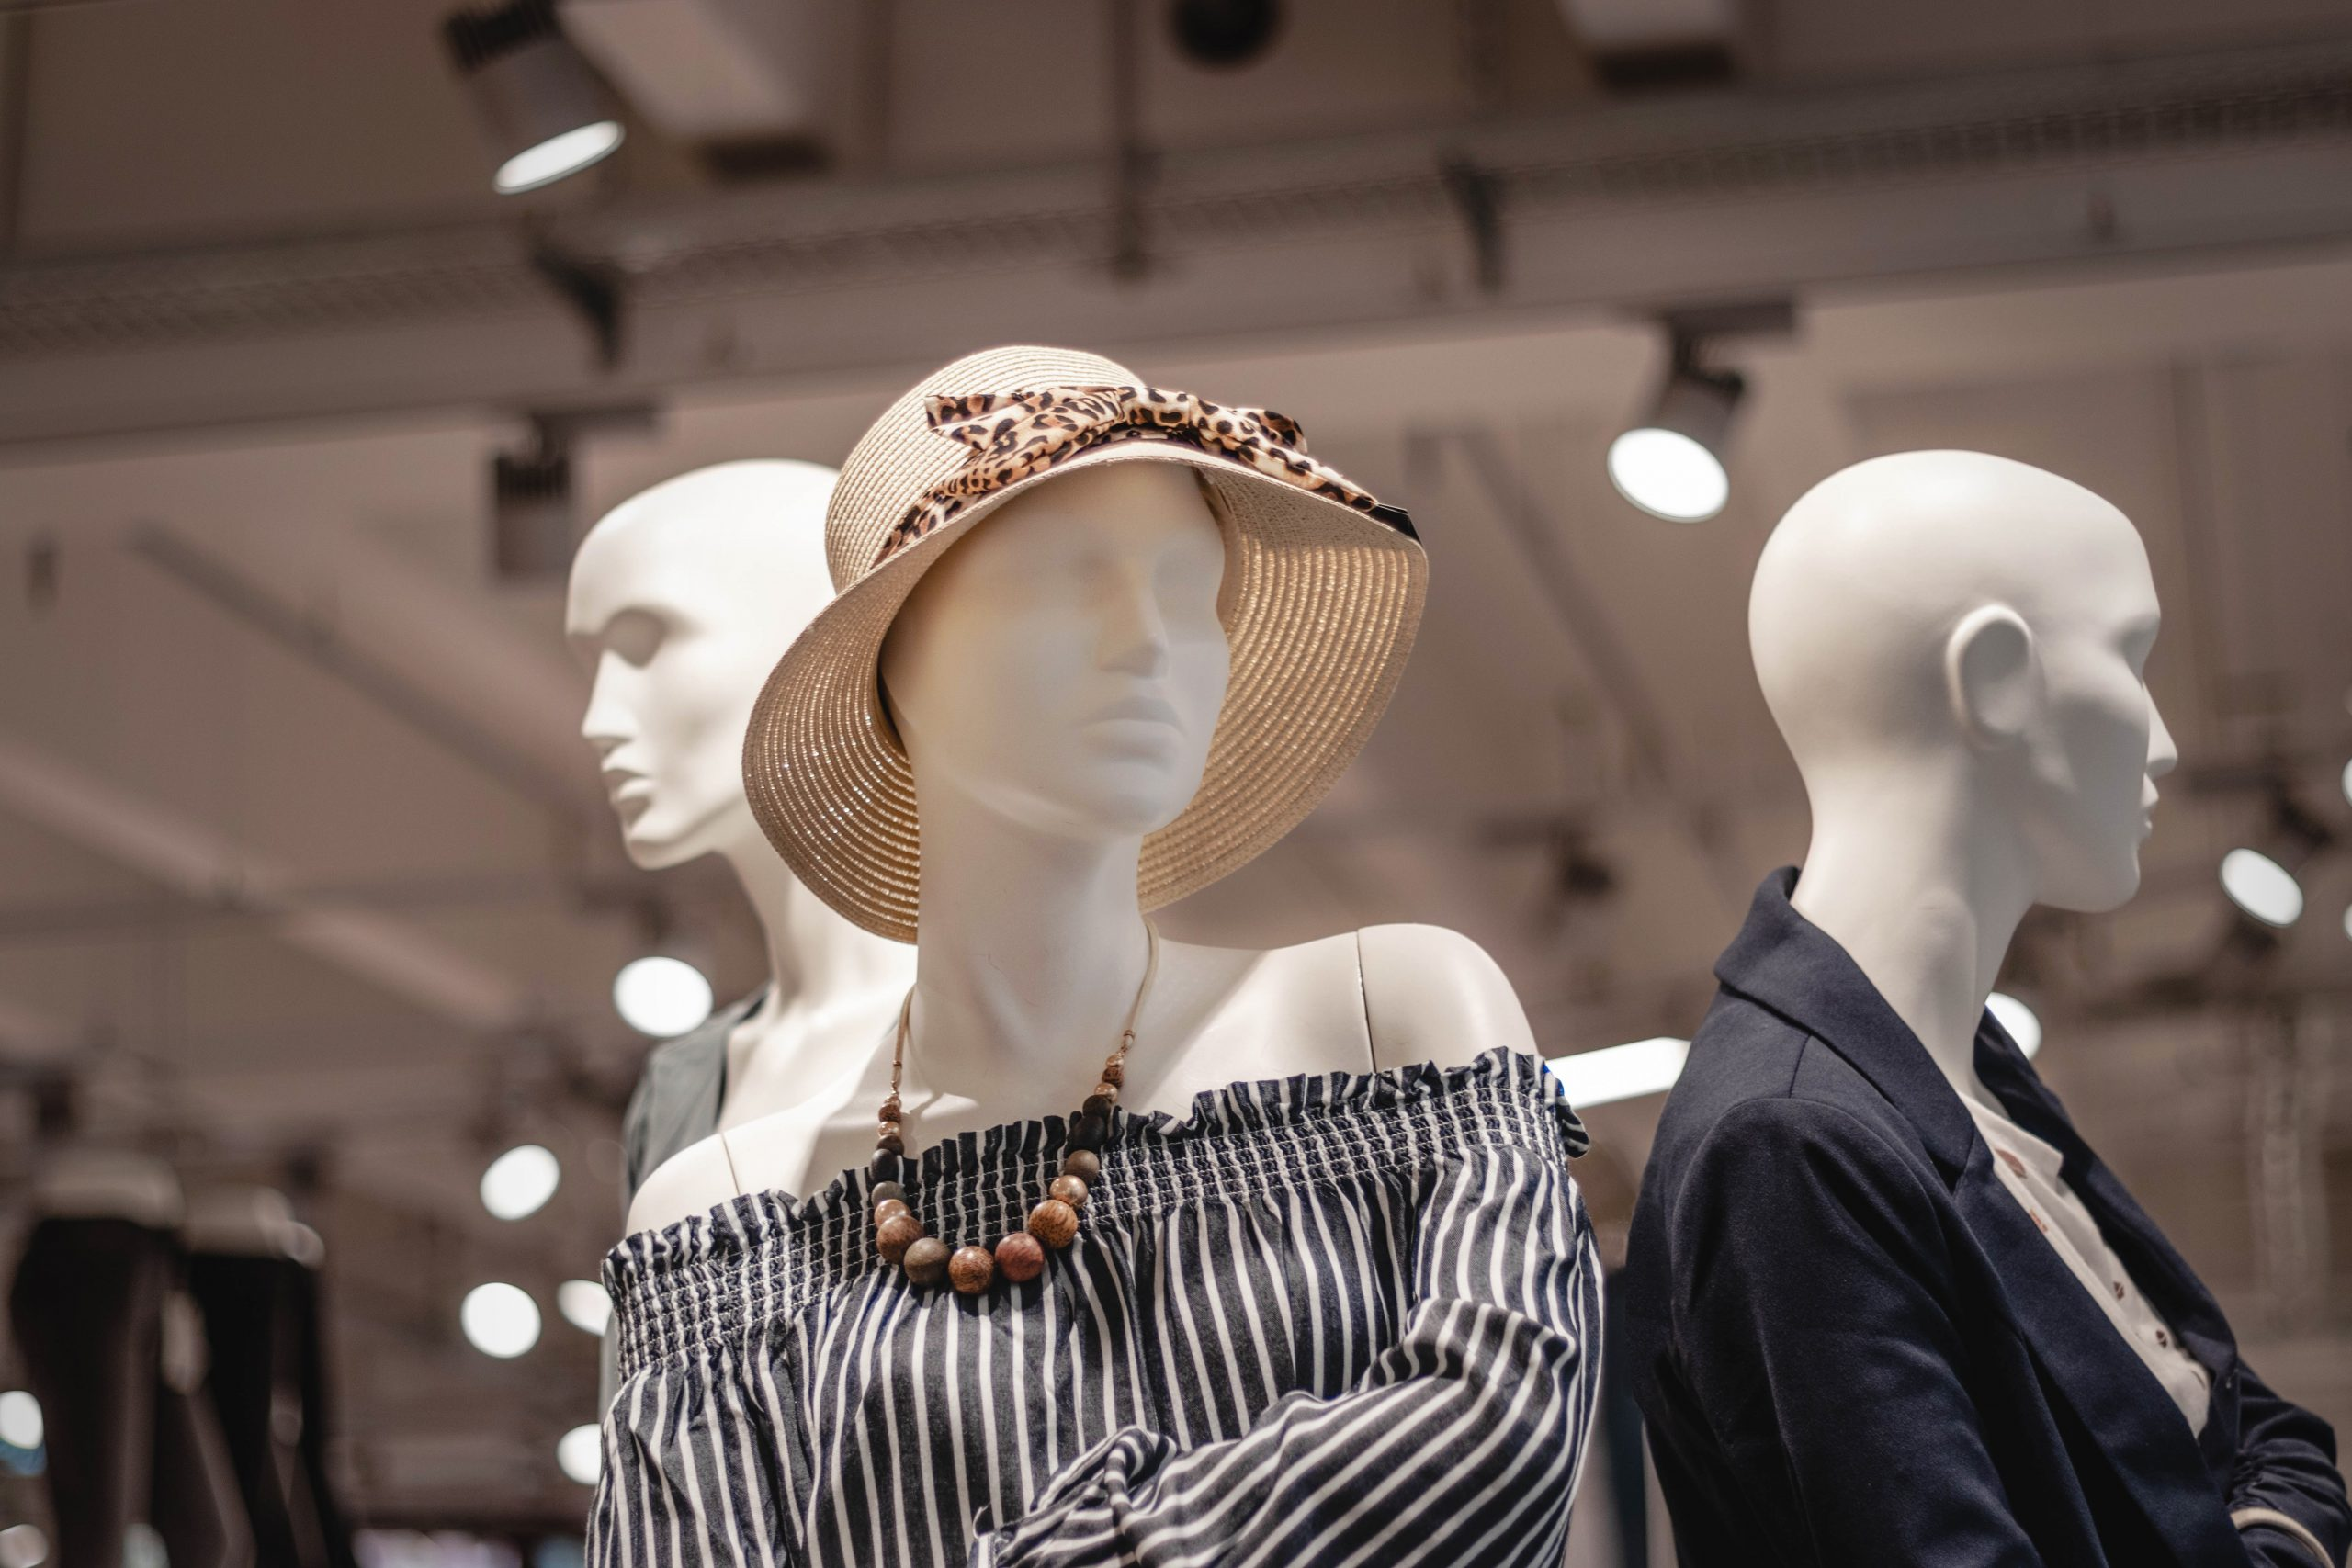 Mannequins at a mall, photo by Sara Kurfeß/Unsplash